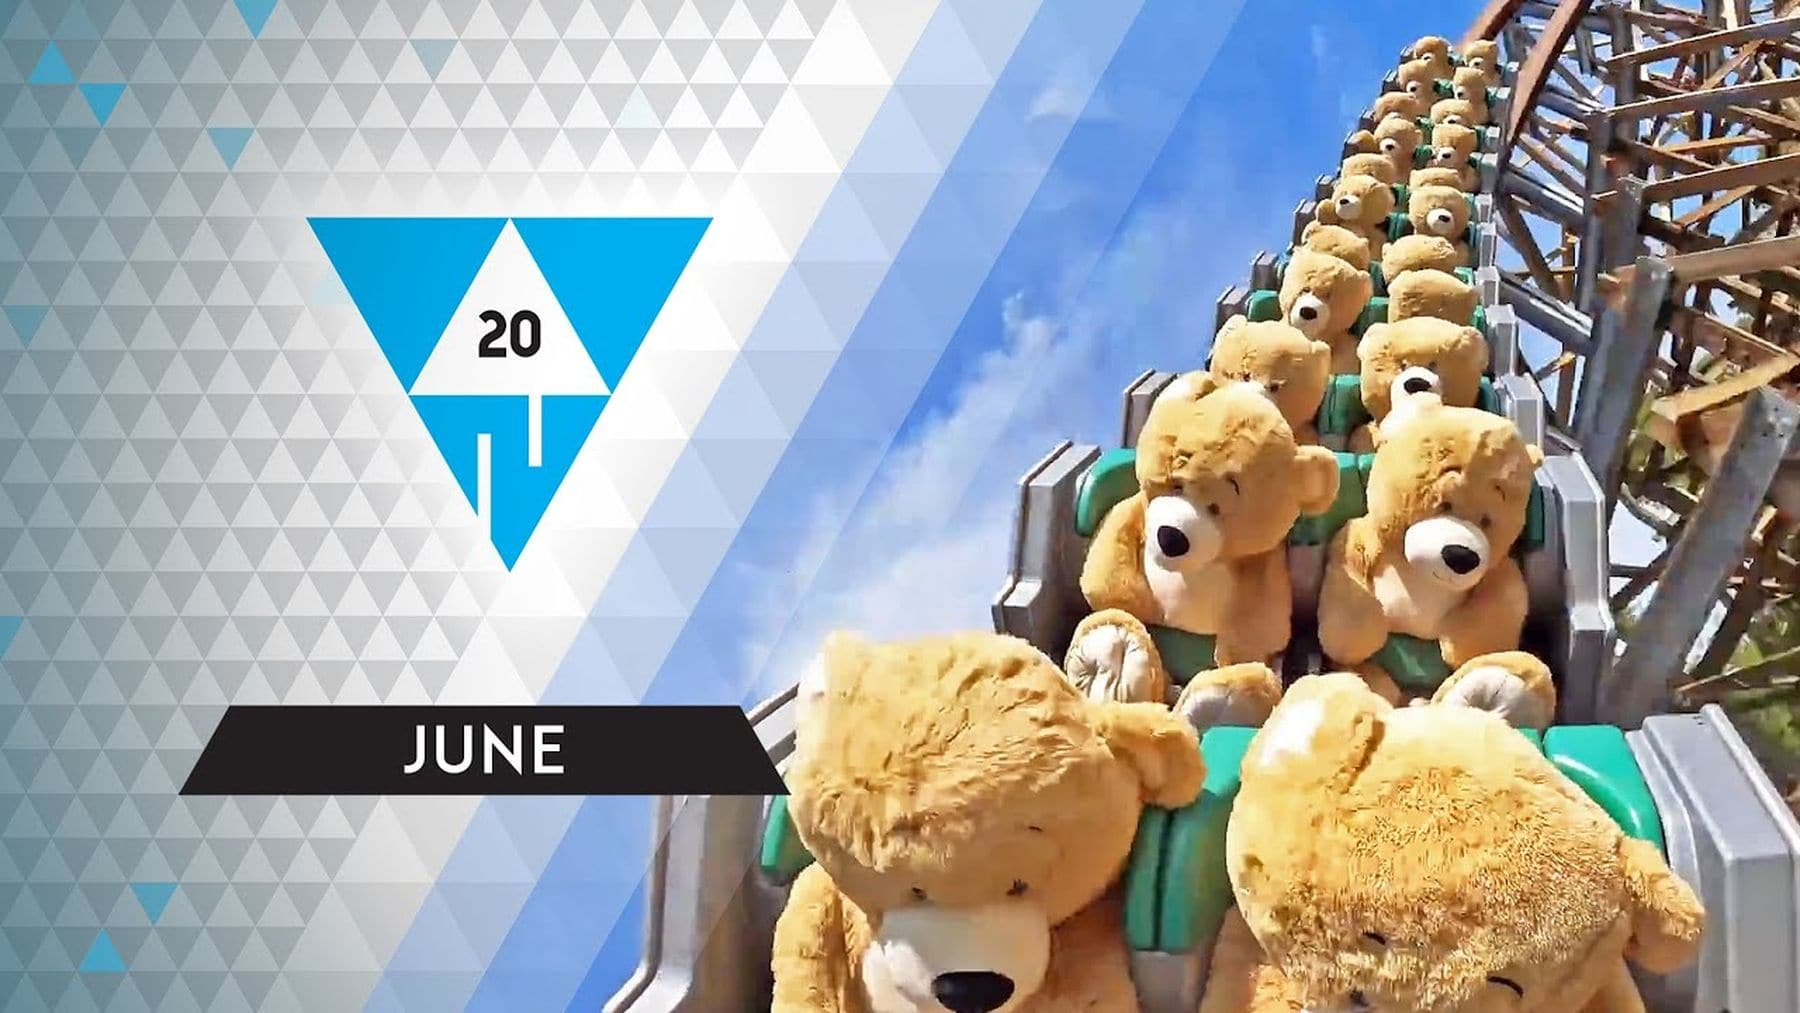 Win-Compilation Juni 2020 | Win-Compilation | Was is hier eigentlich los?